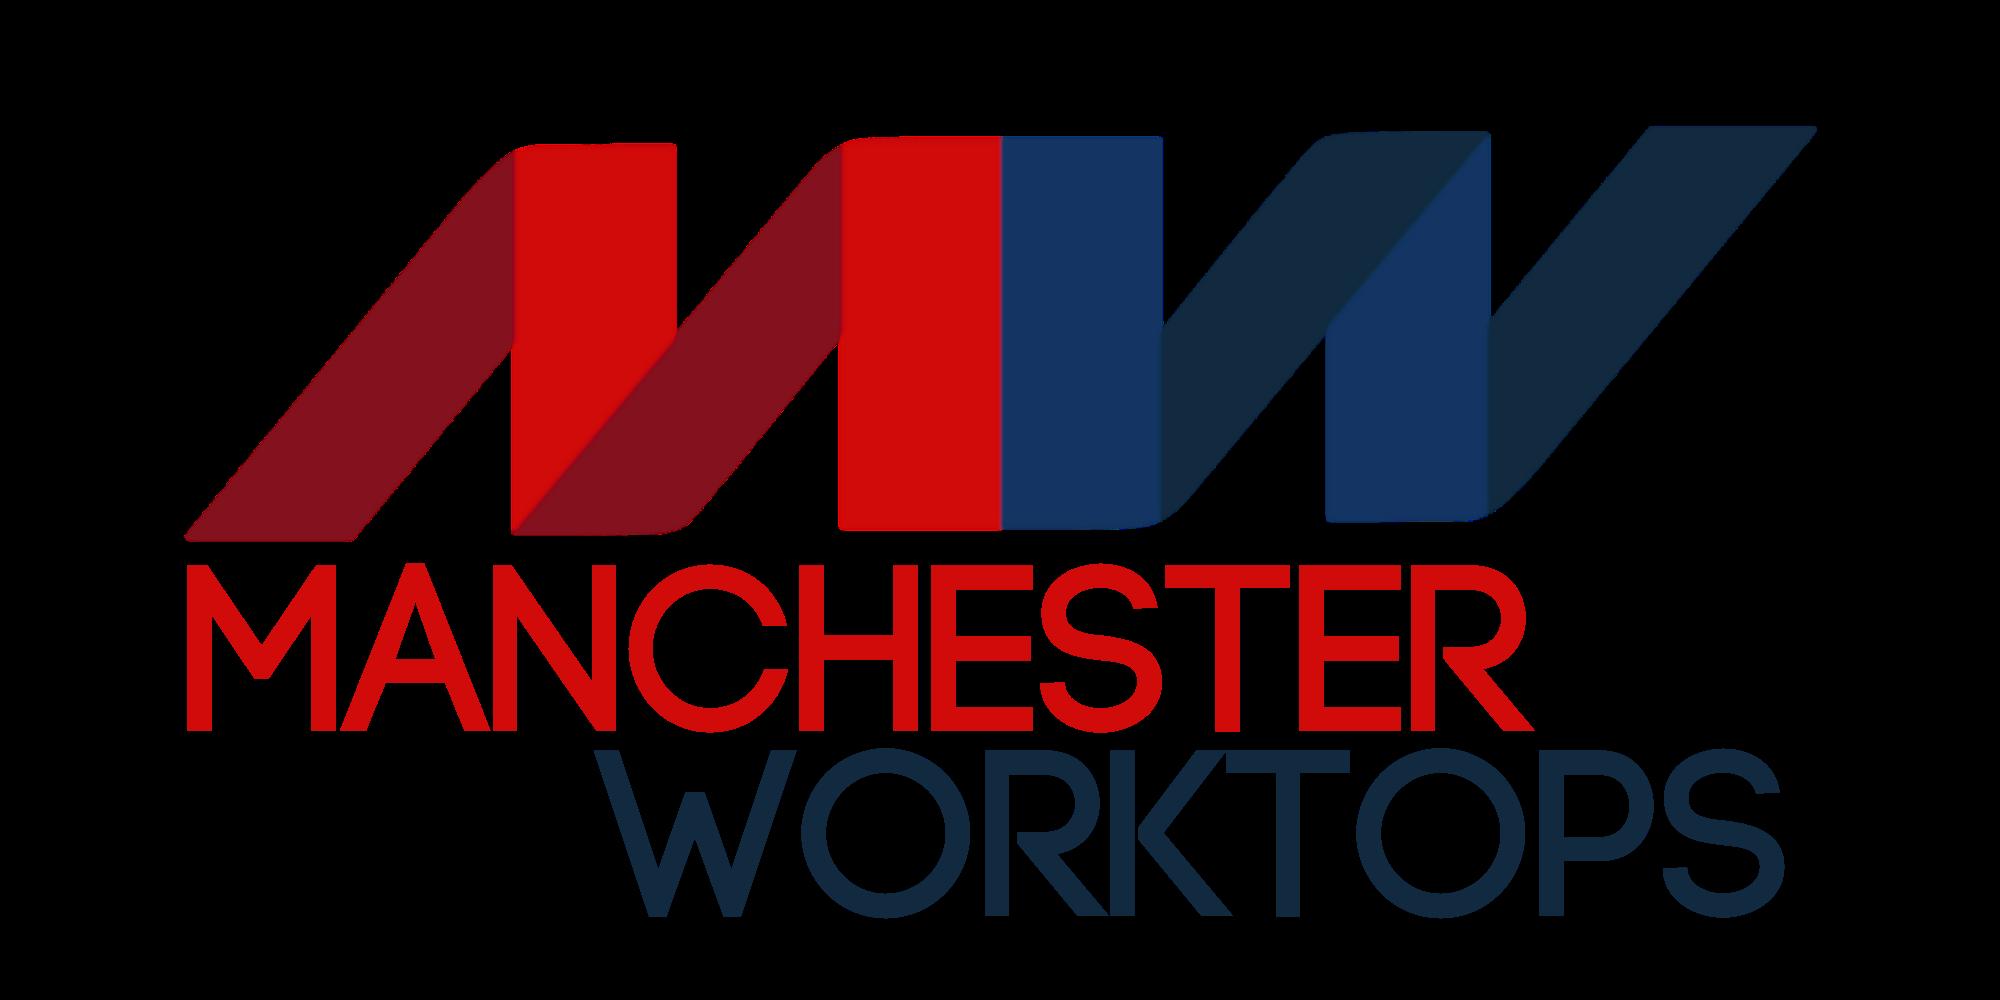 Manchester Worktops